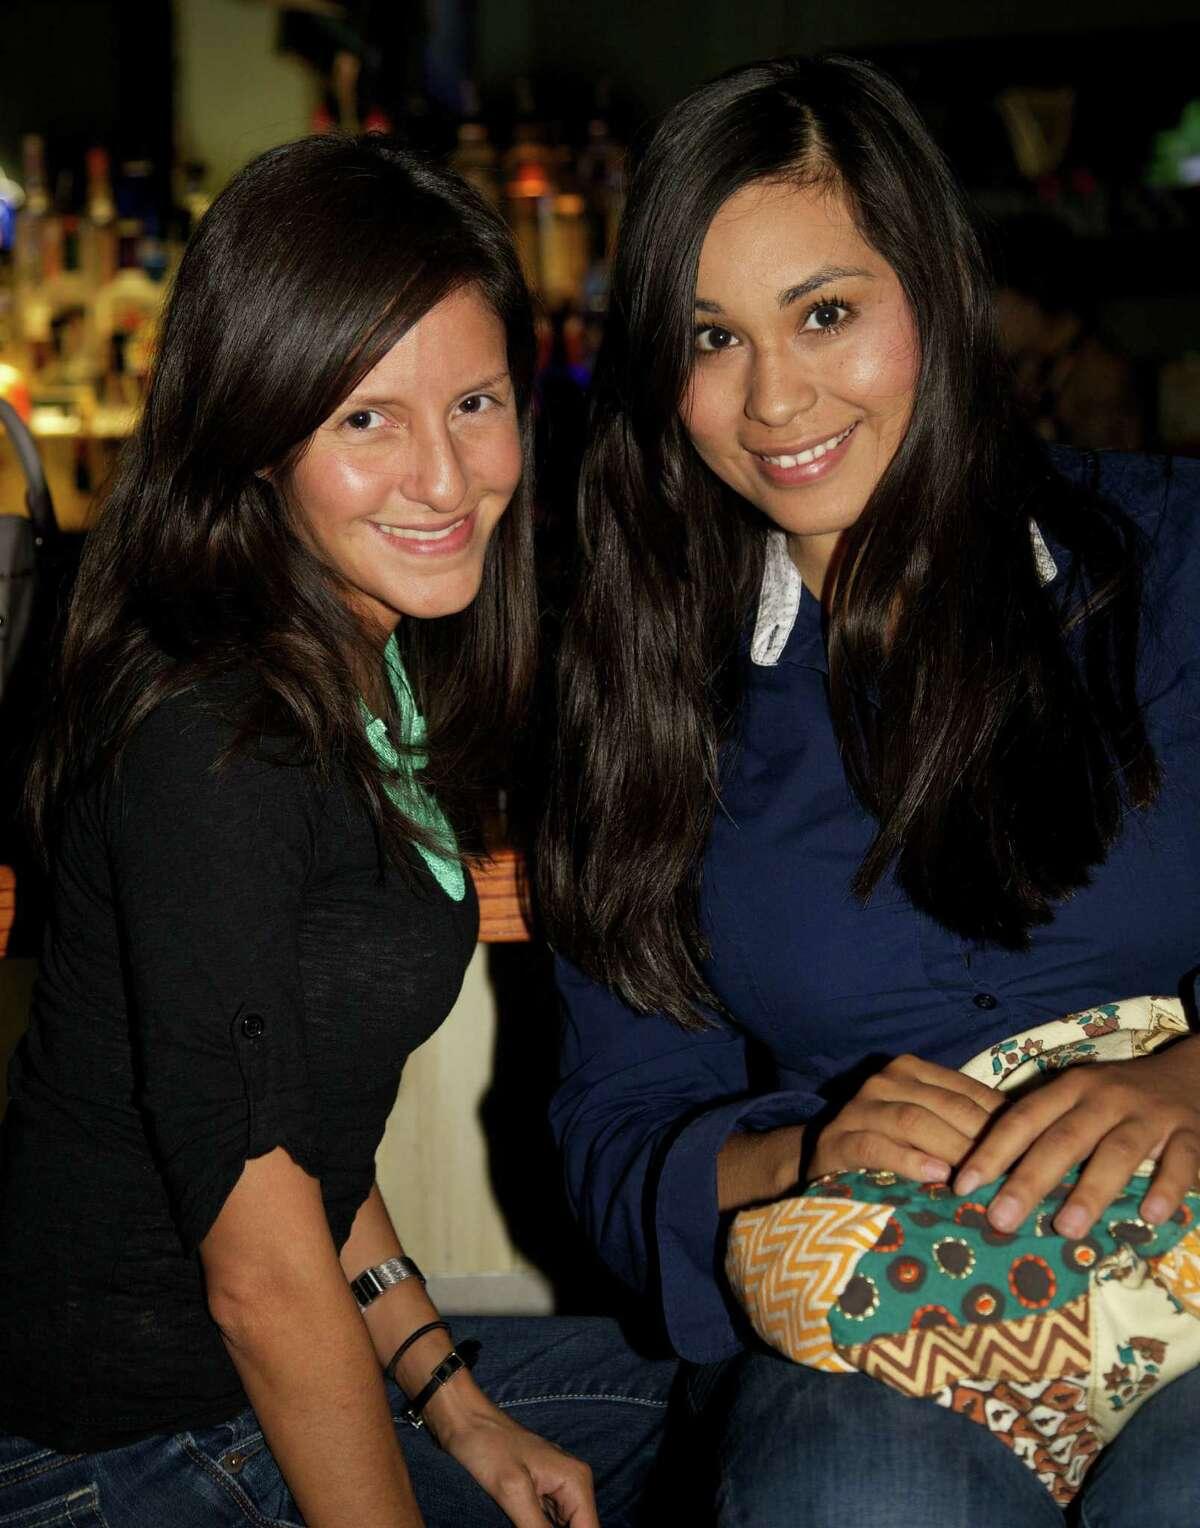 Violet Martinez and Crystal Vilano